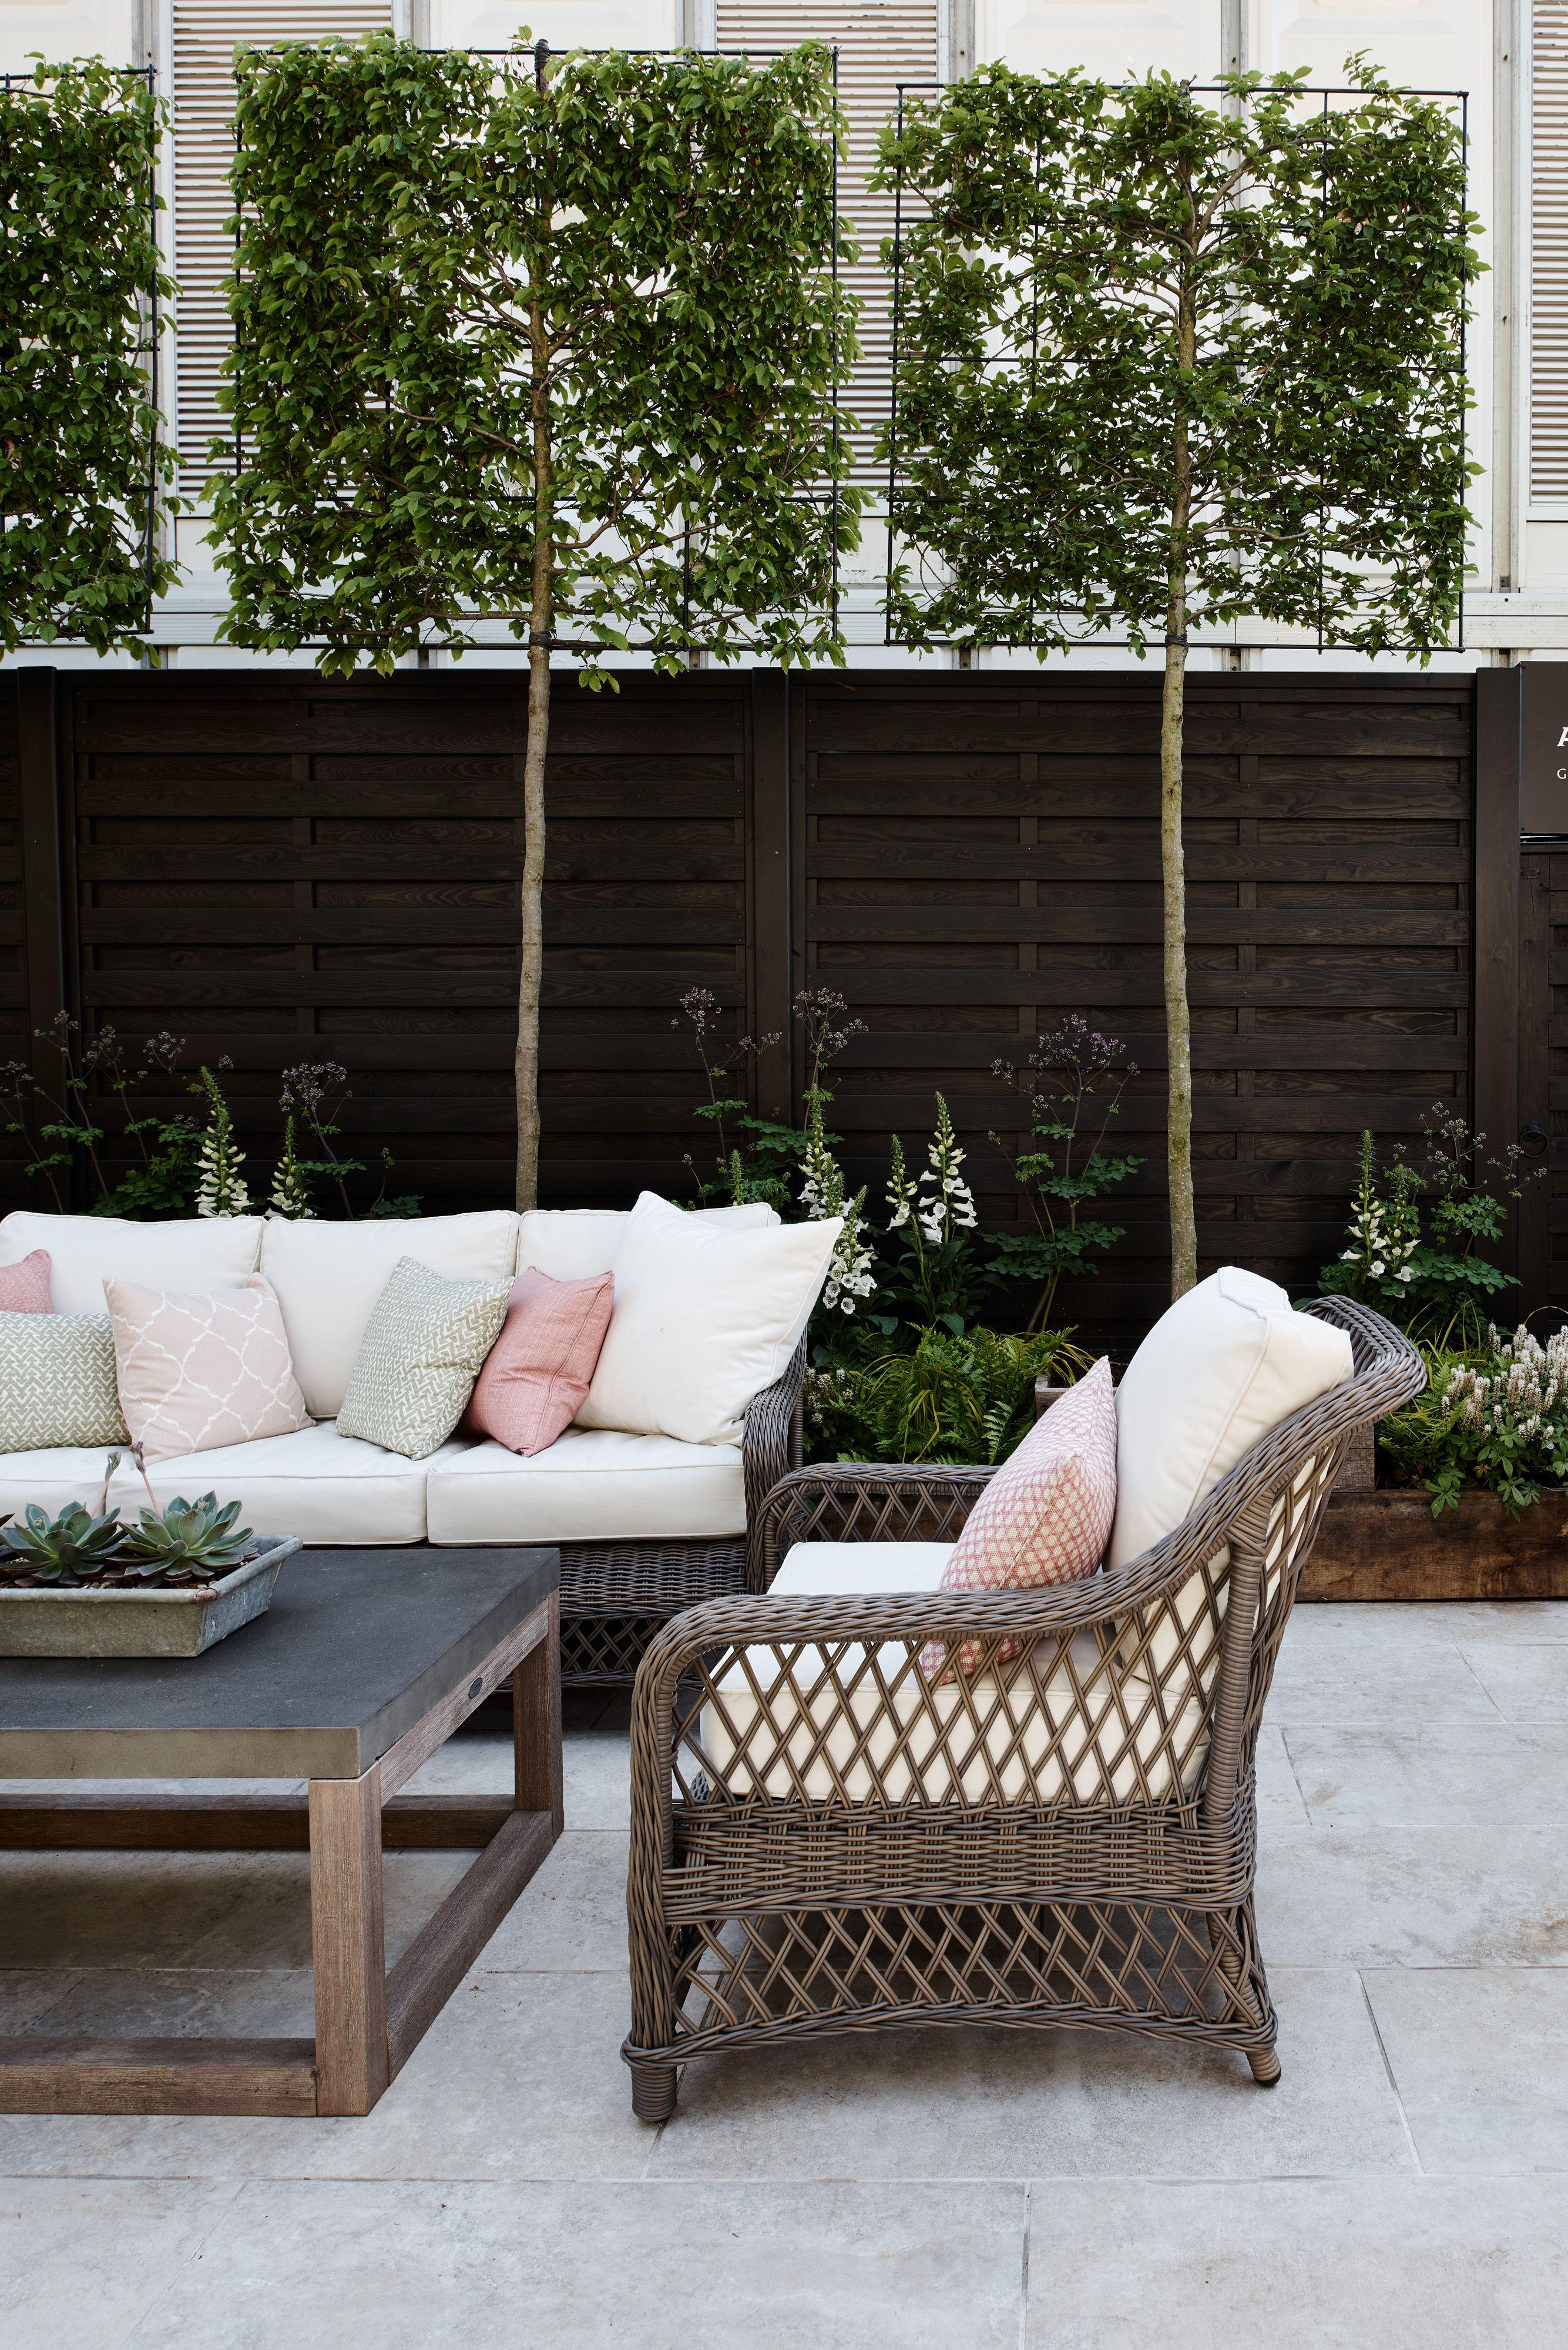 chelsea flower show   garden, patio & porch 3   garden design